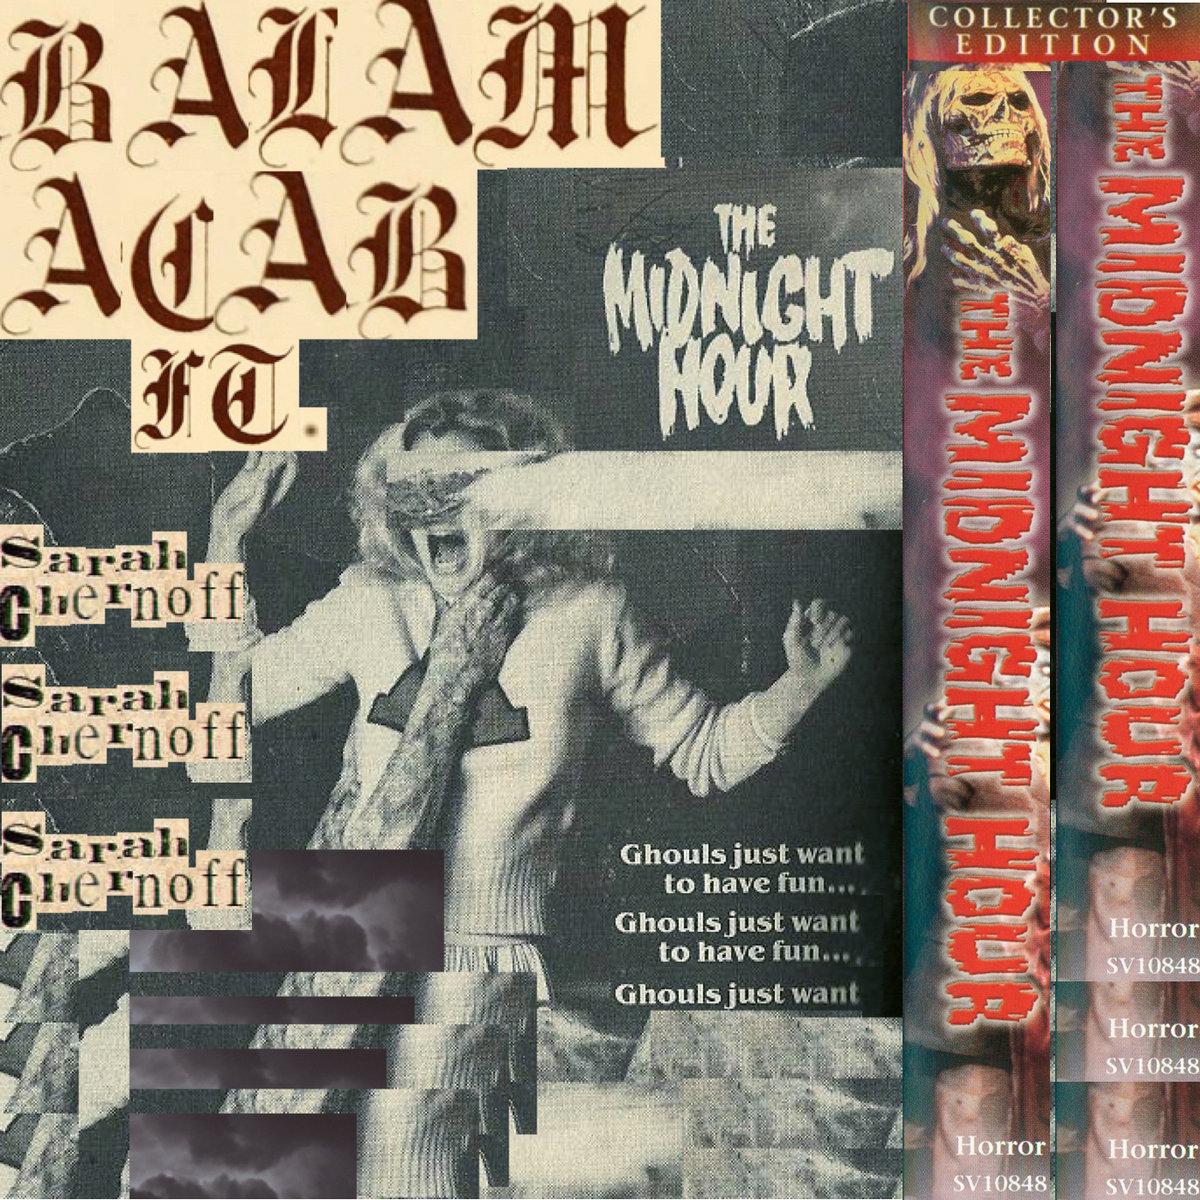 Balam Acab Ft. Sarah Chernoff - The Midnight Hour